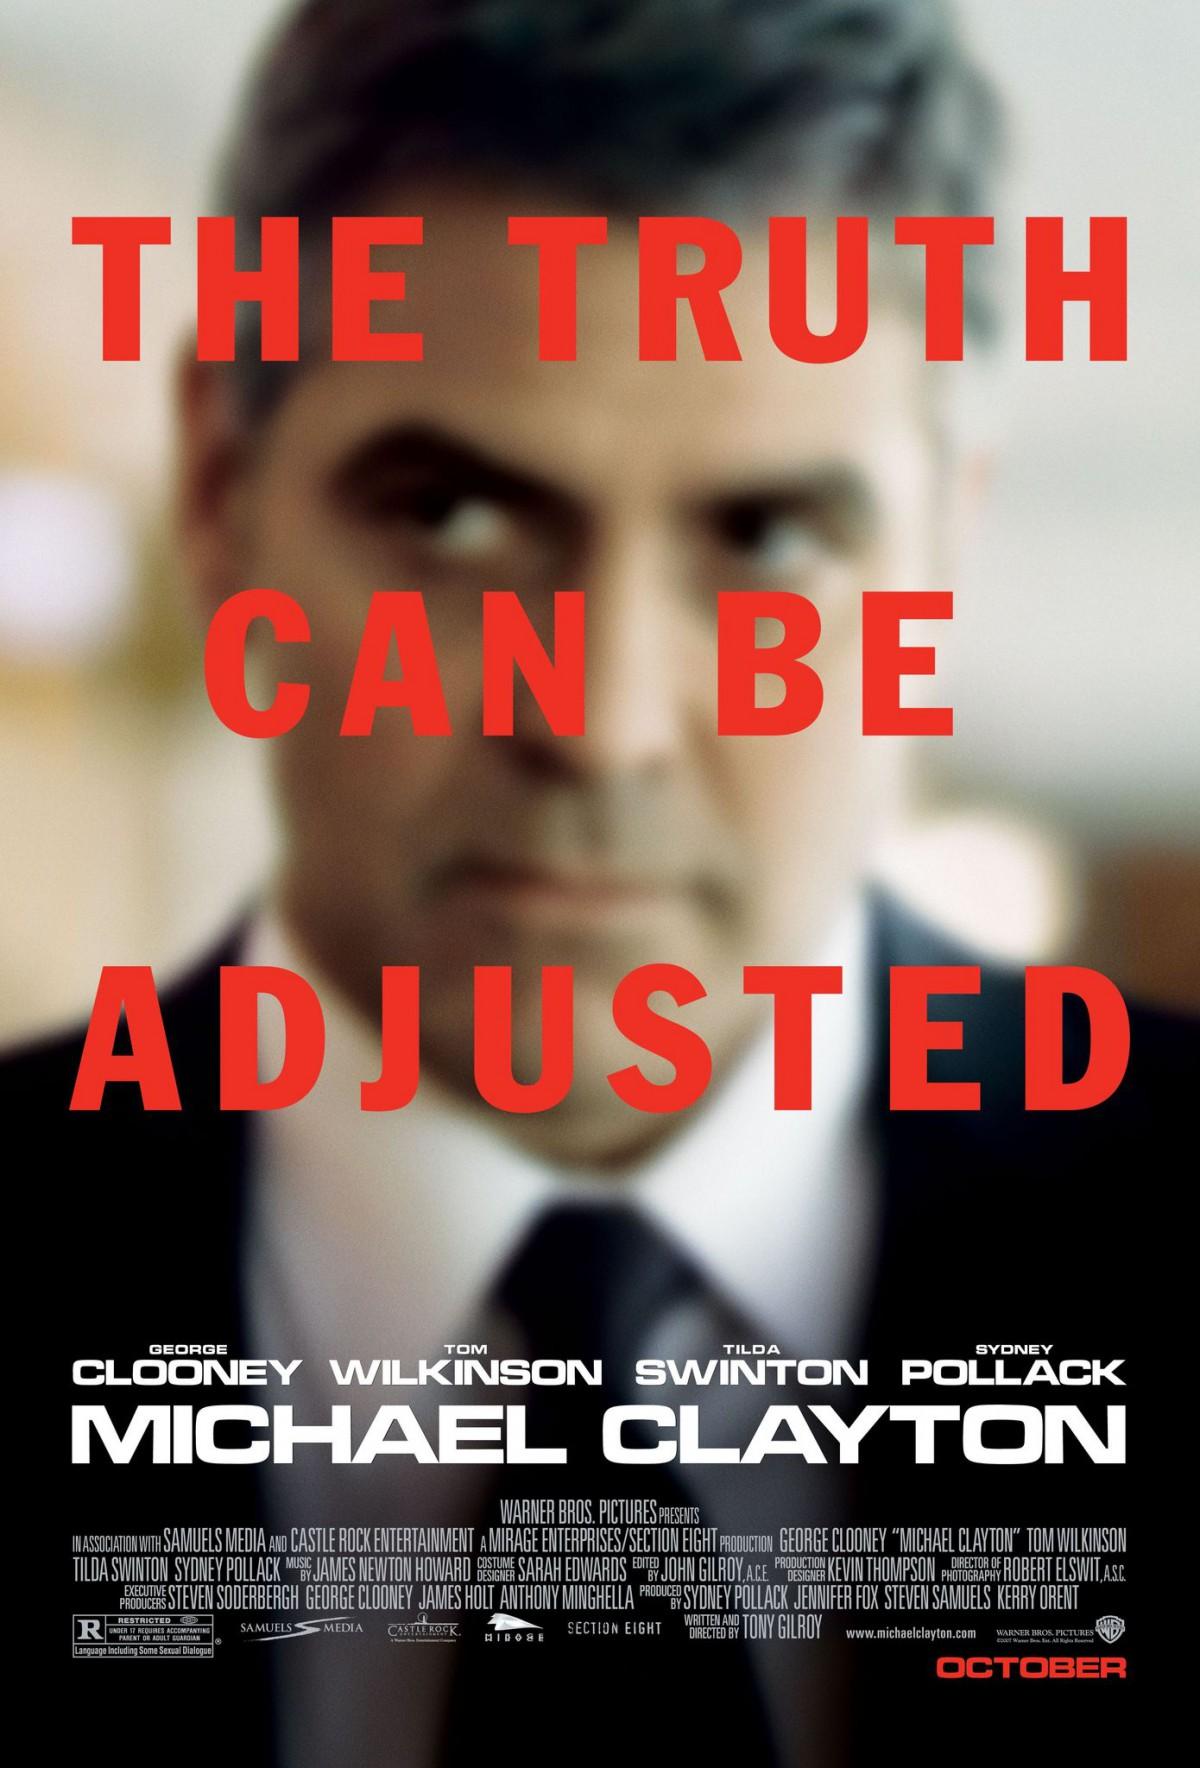 96. Michael Clayton (2007)